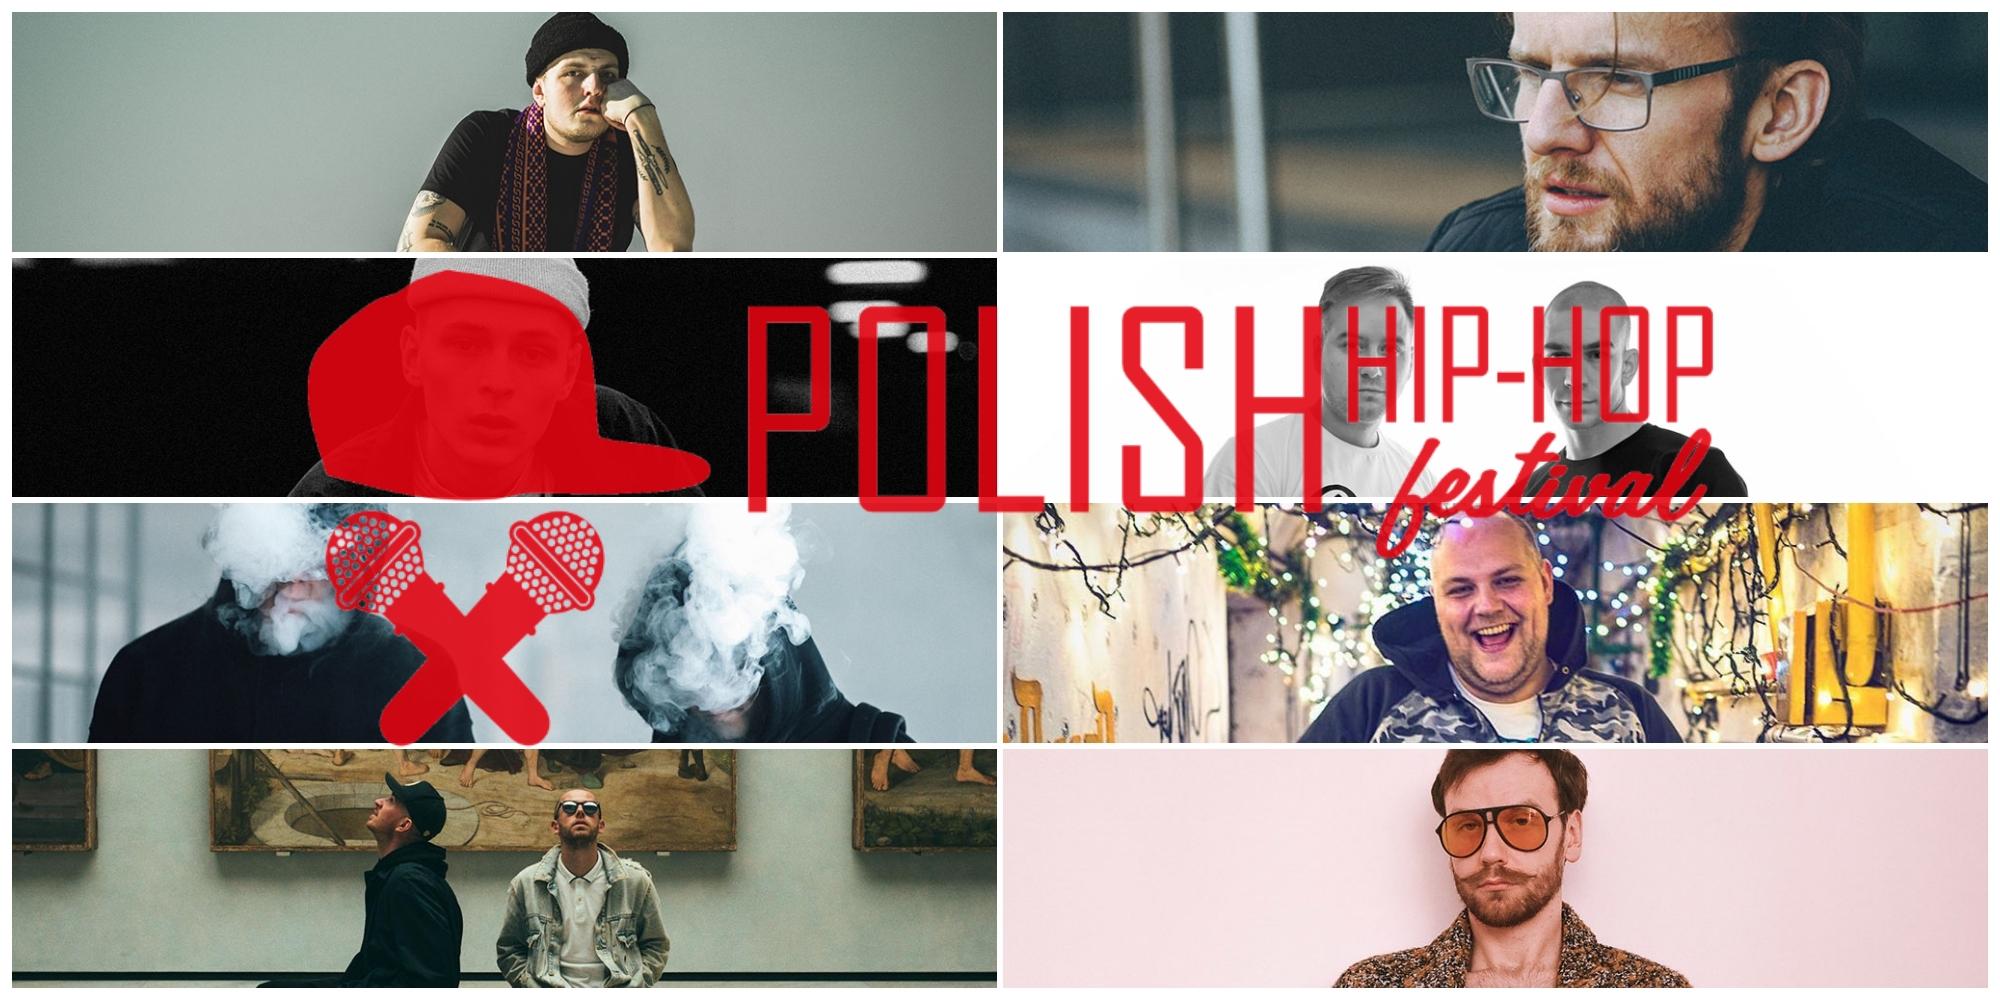 5 ogłoszenie Polish Hip-Hop Festival Płock 2019!